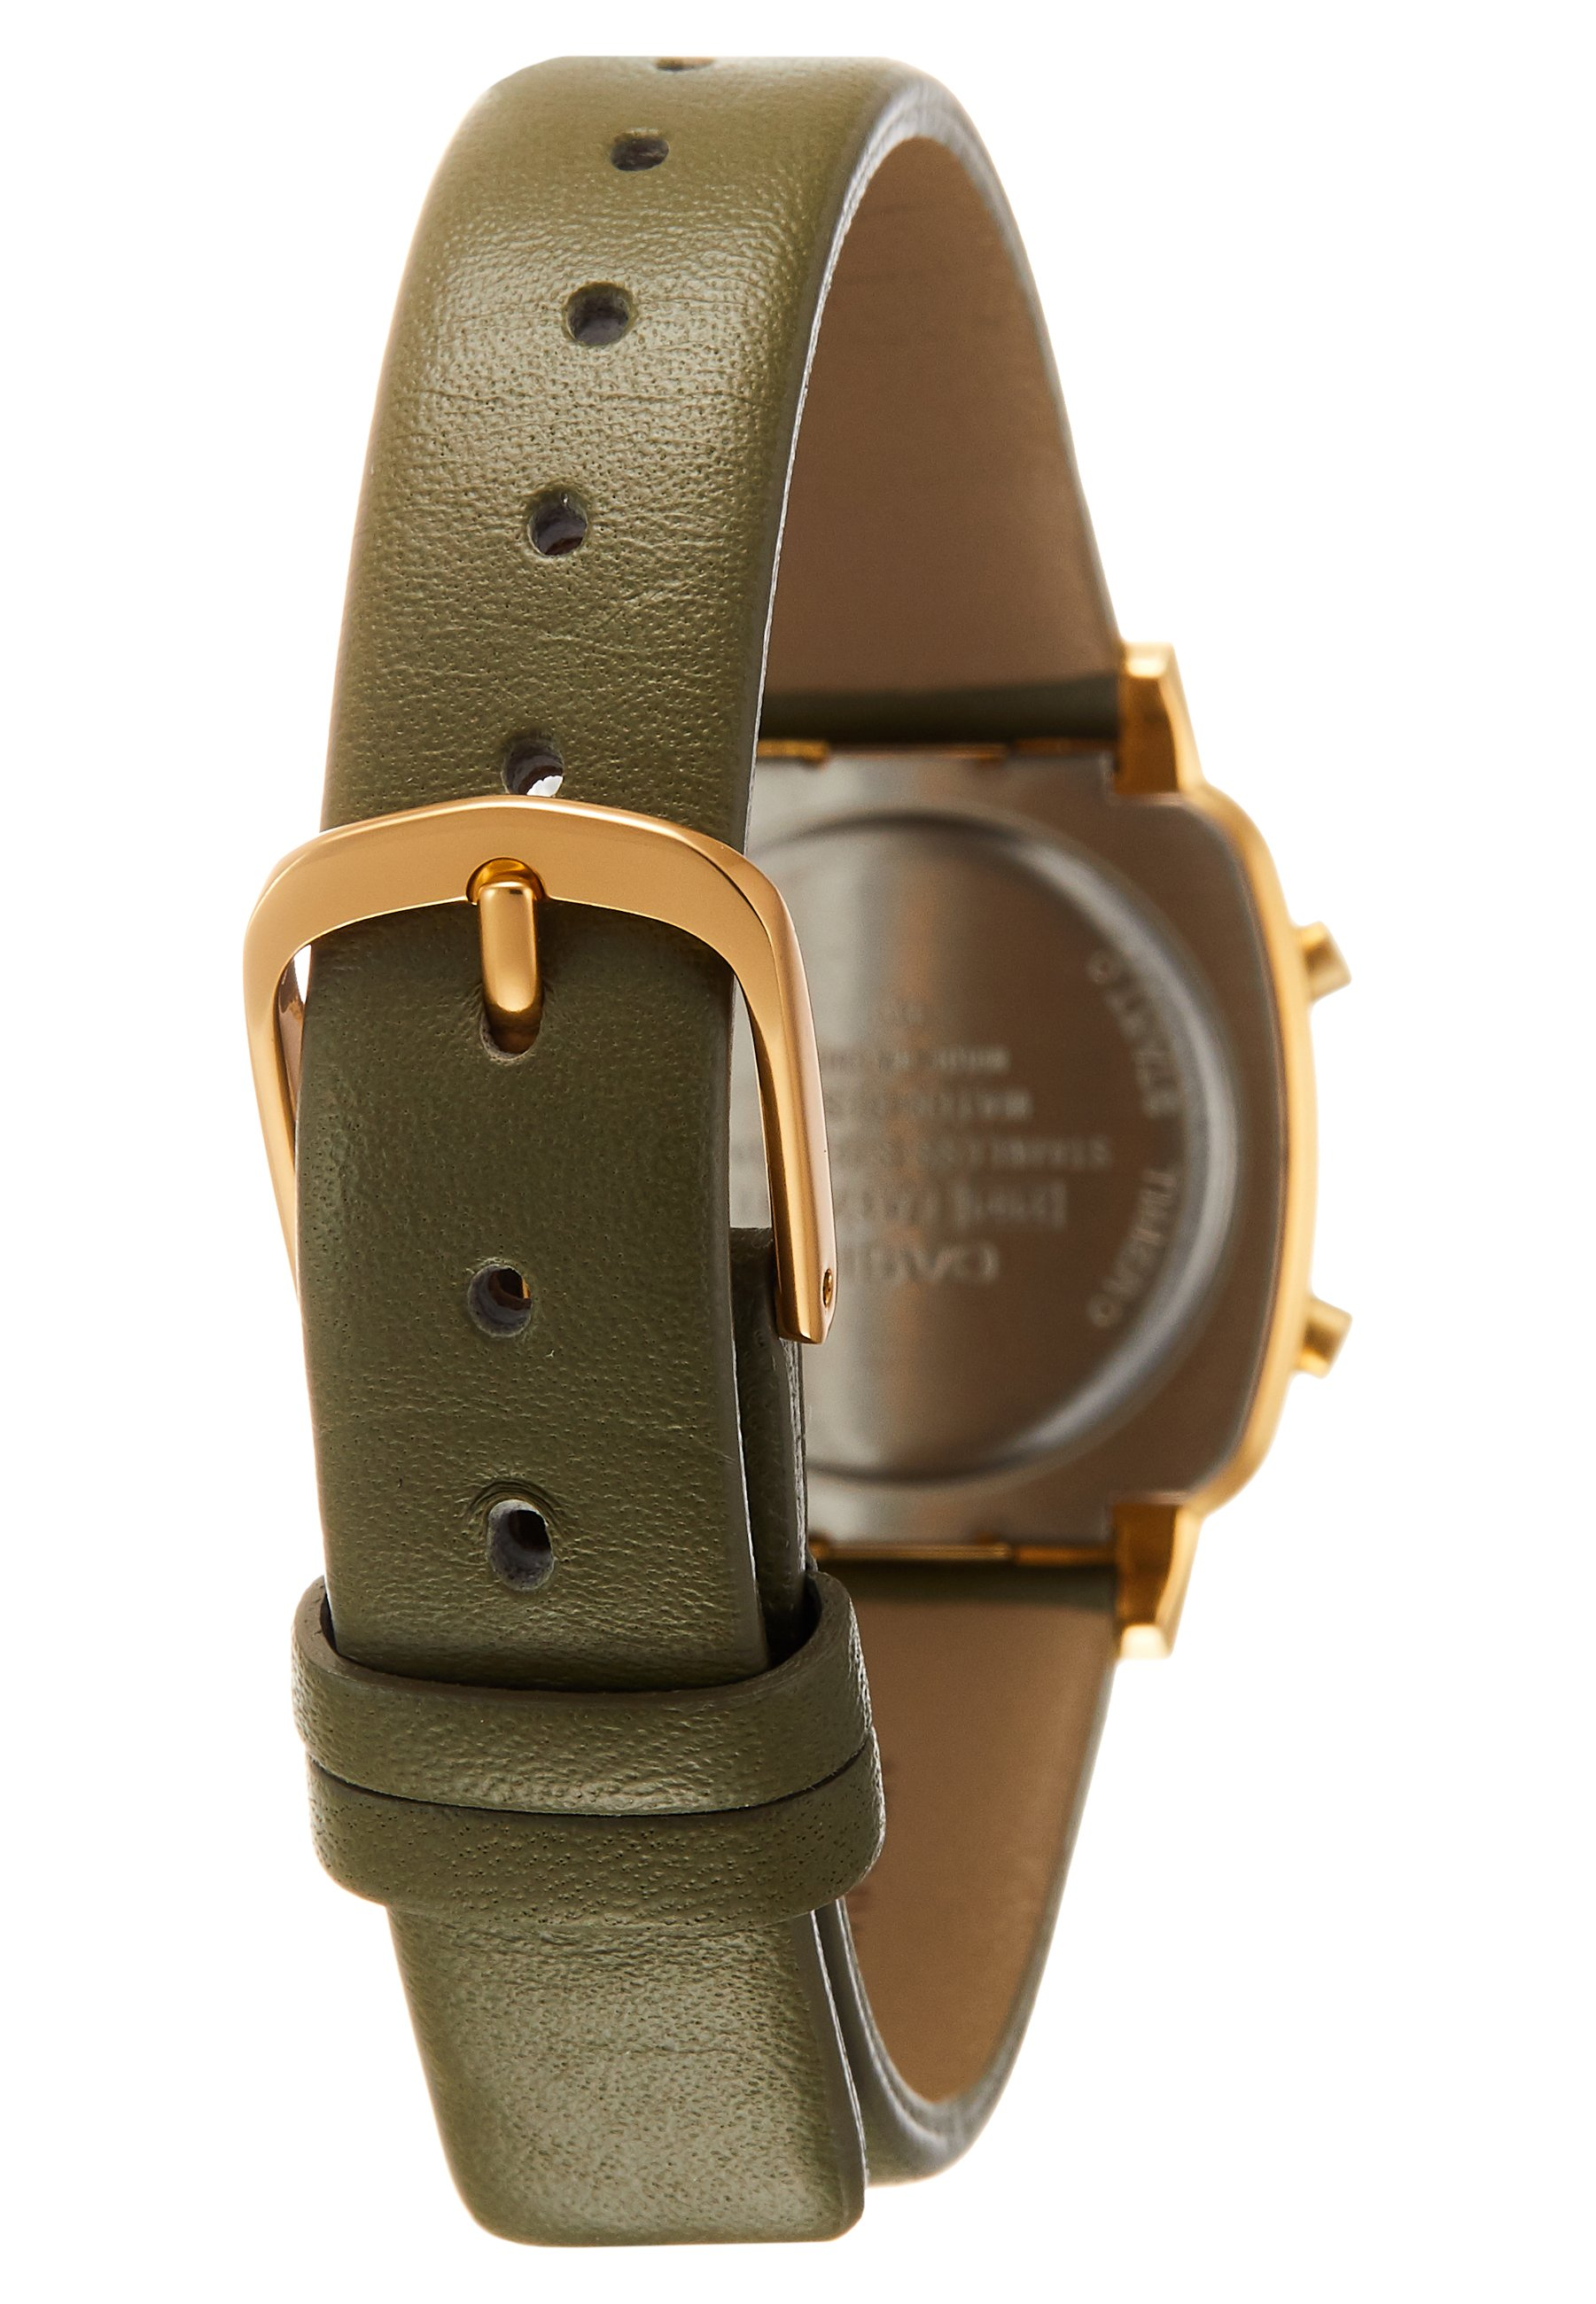 Casio Digital Watch - Green